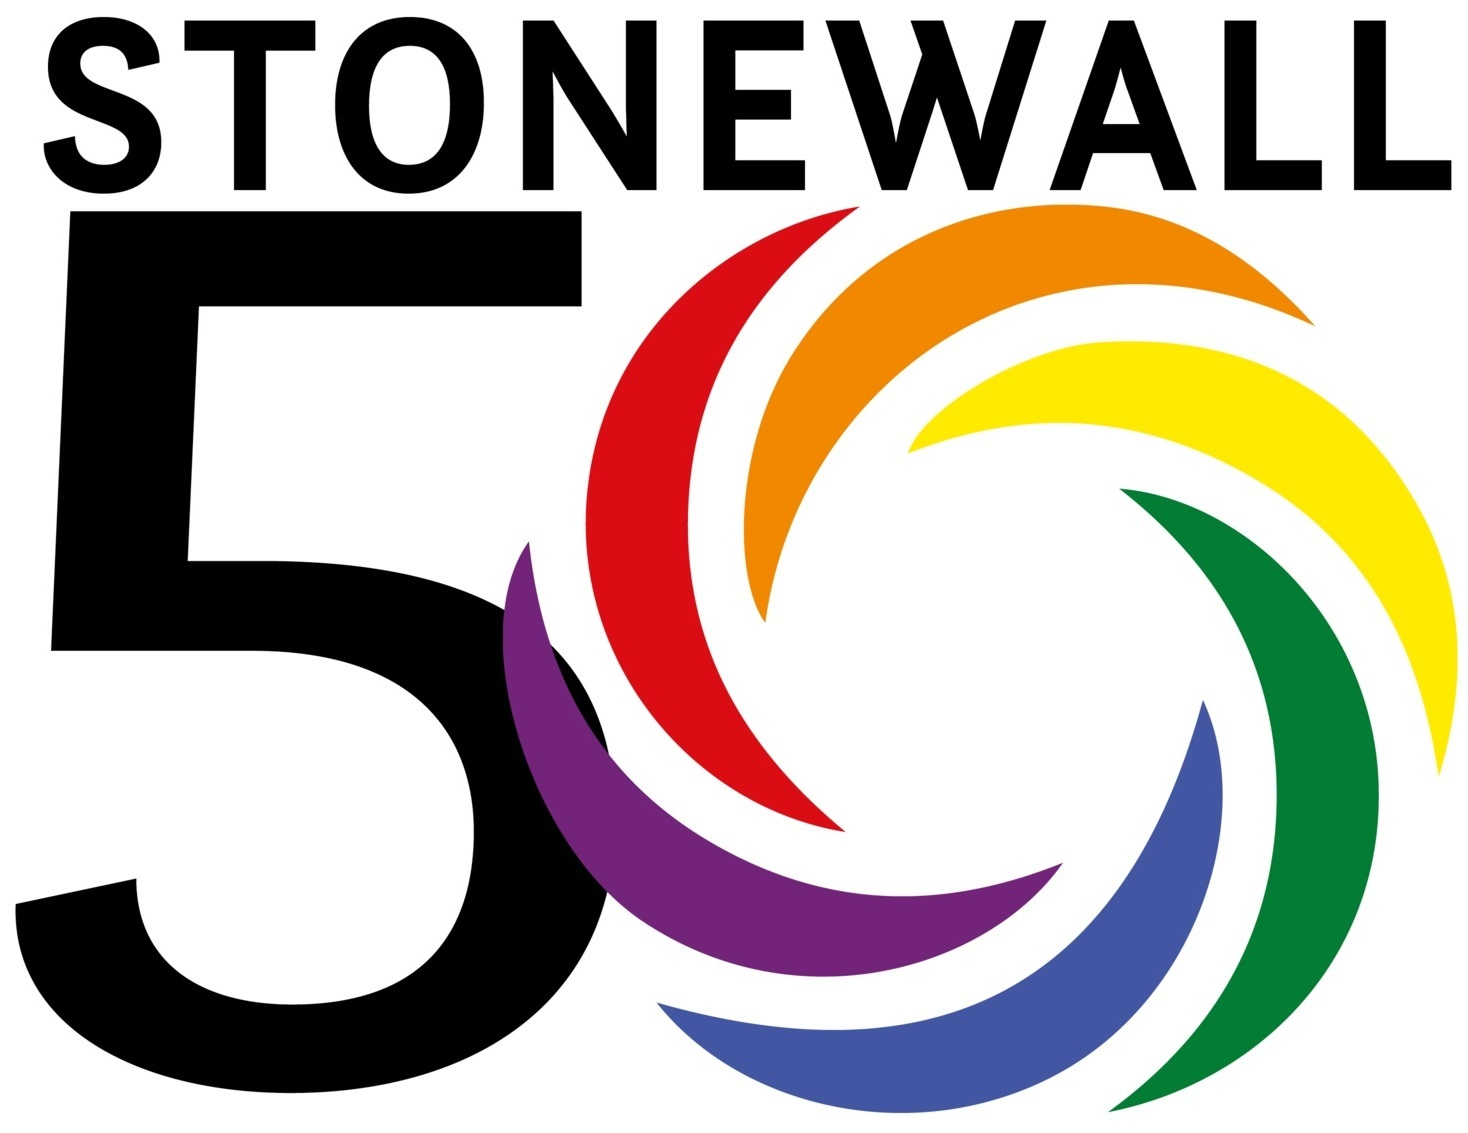 Stonewall%252B50%252Blogo%252Bwhite%252BTW.jpg